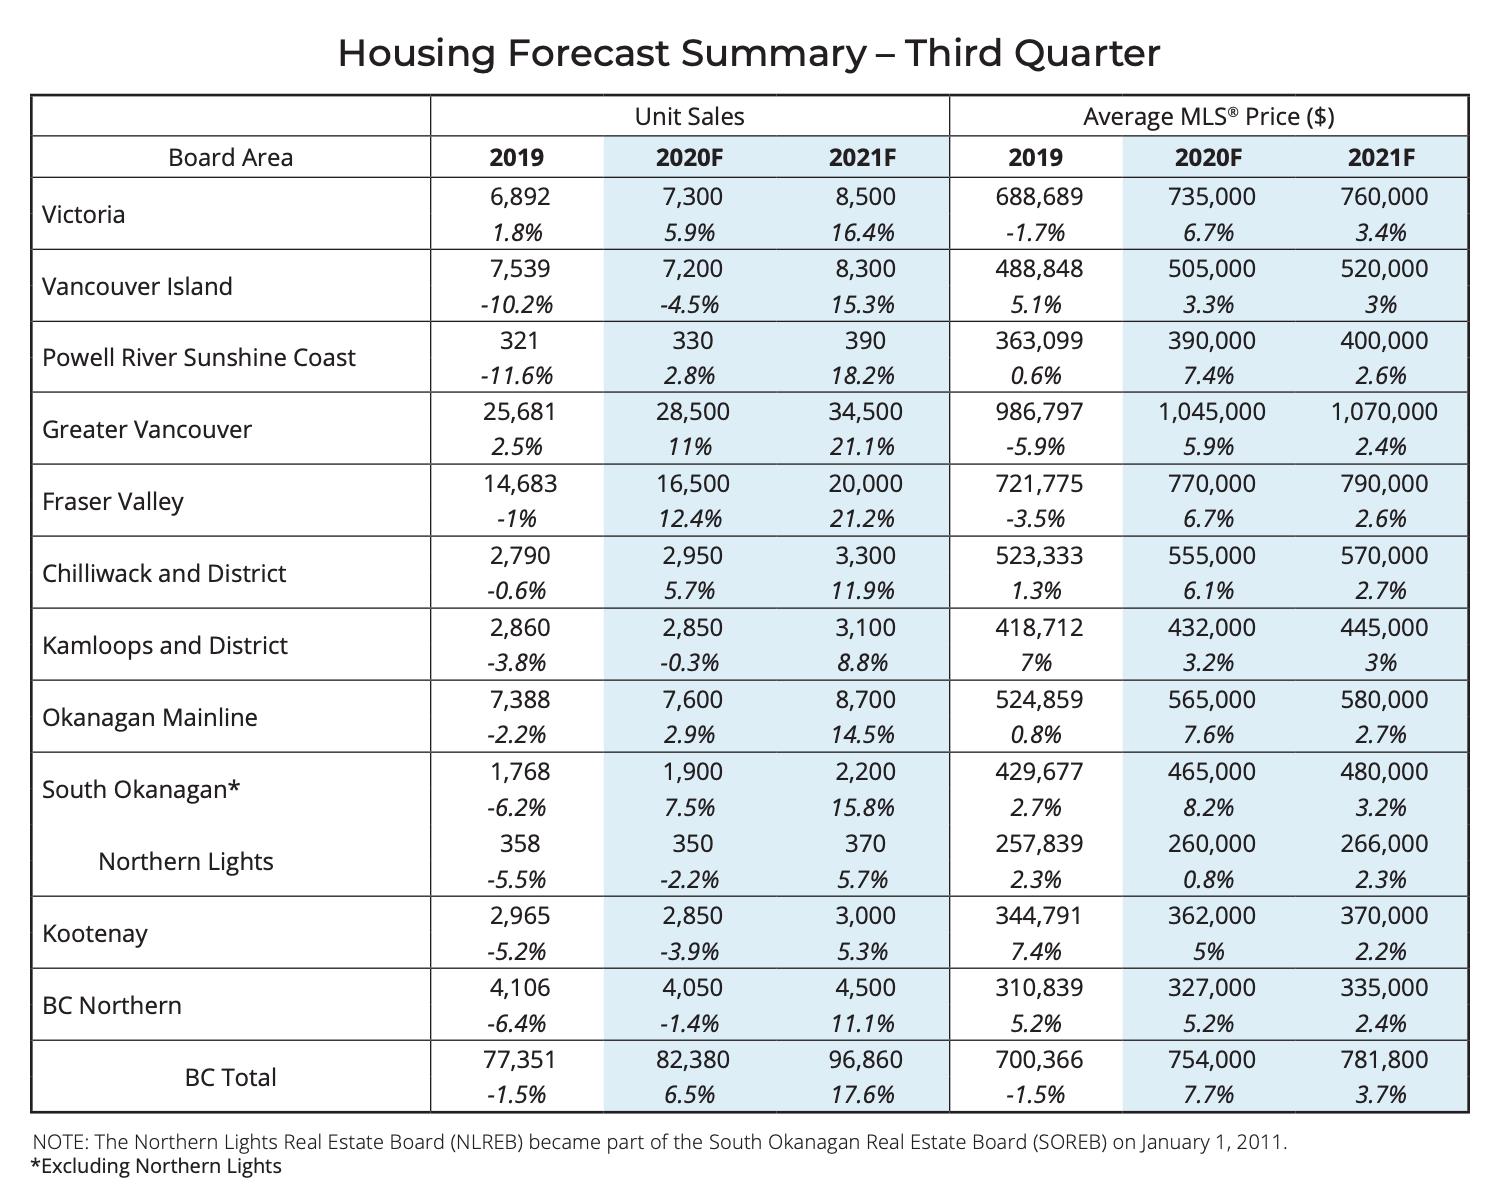 Q3 Housing Forecast Summary